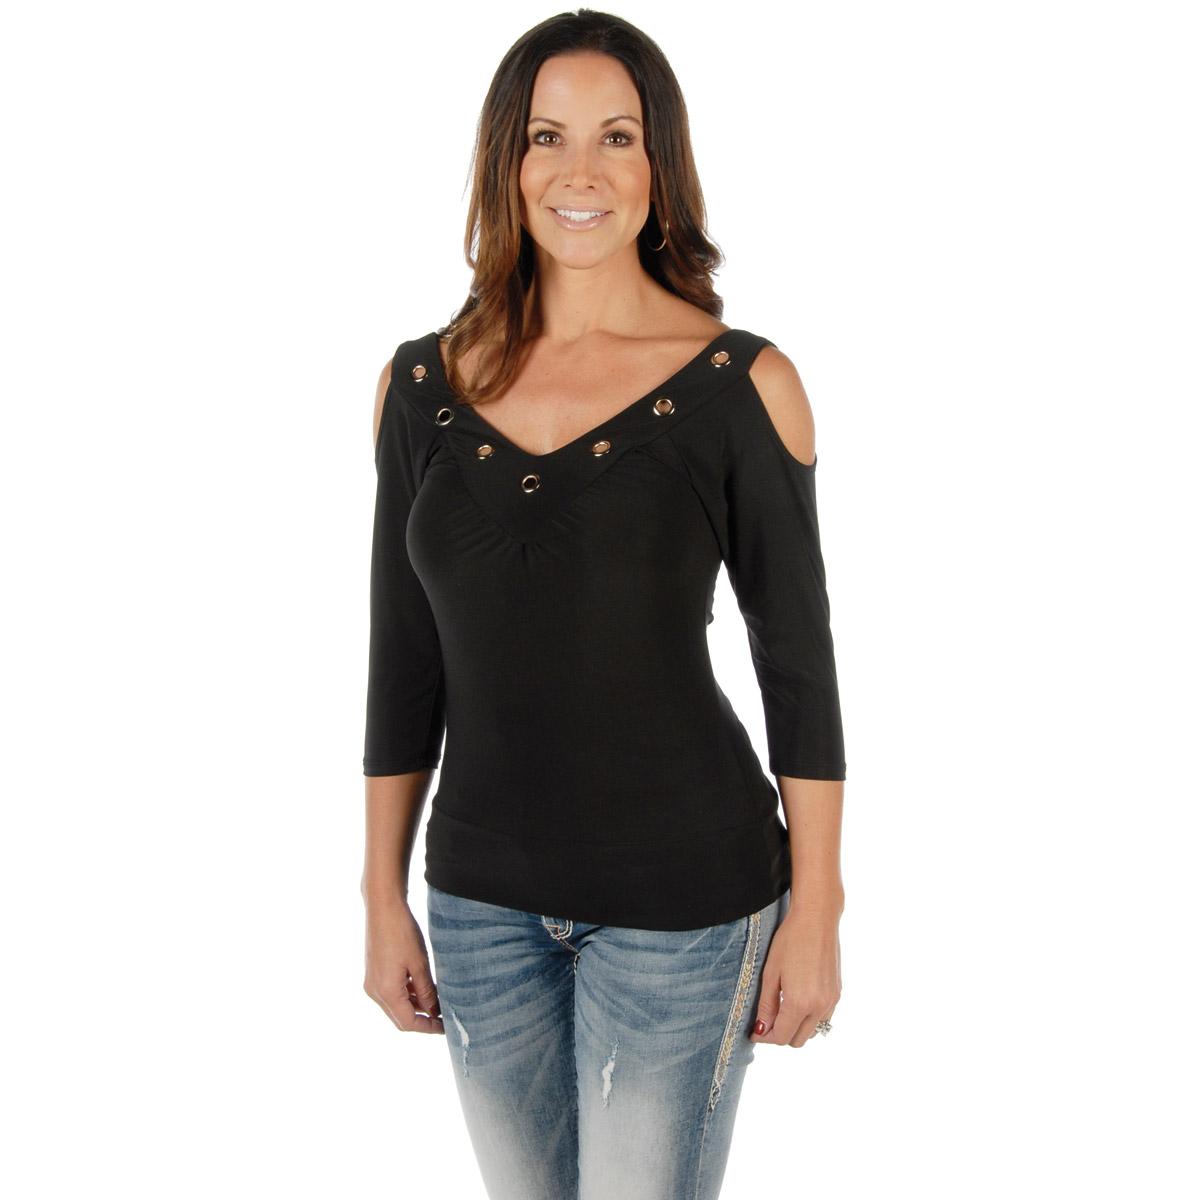 Liberty Wear Women's Hard Core Sasha Black V-Neck Top